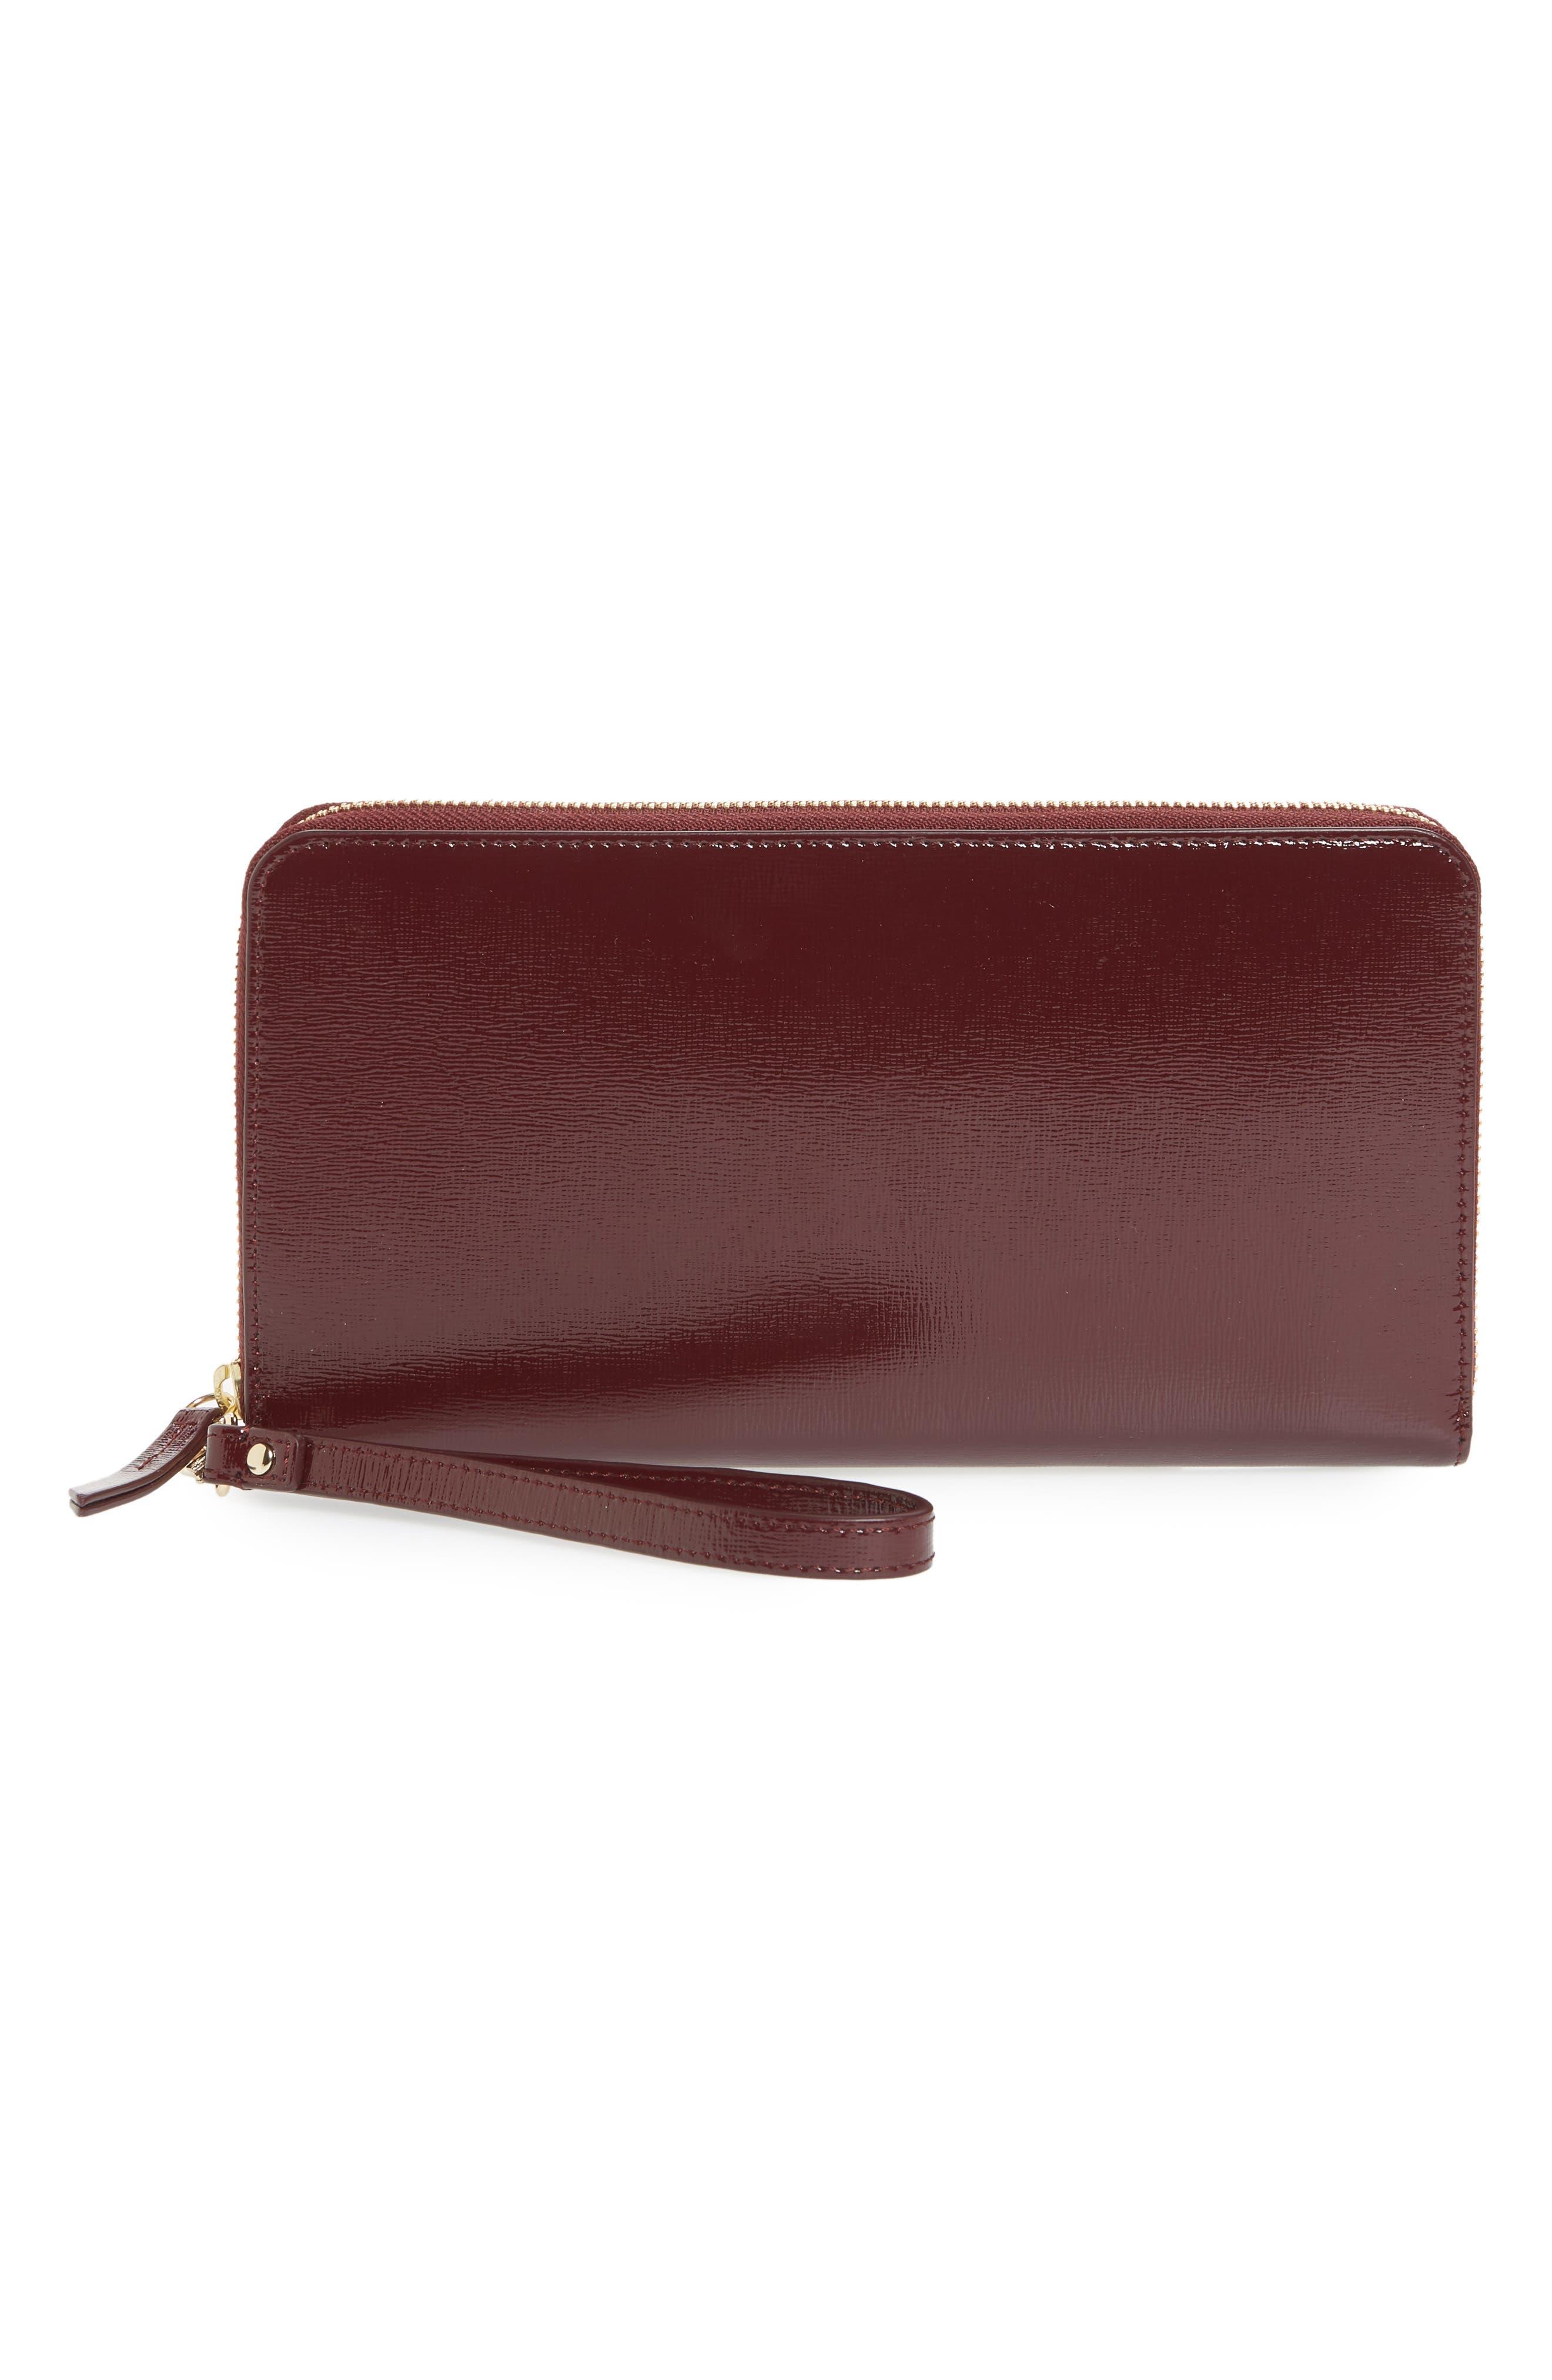 Wanderlust Leather Travel Wallet,                         Main,                         color, BURGUNDY ROYALE